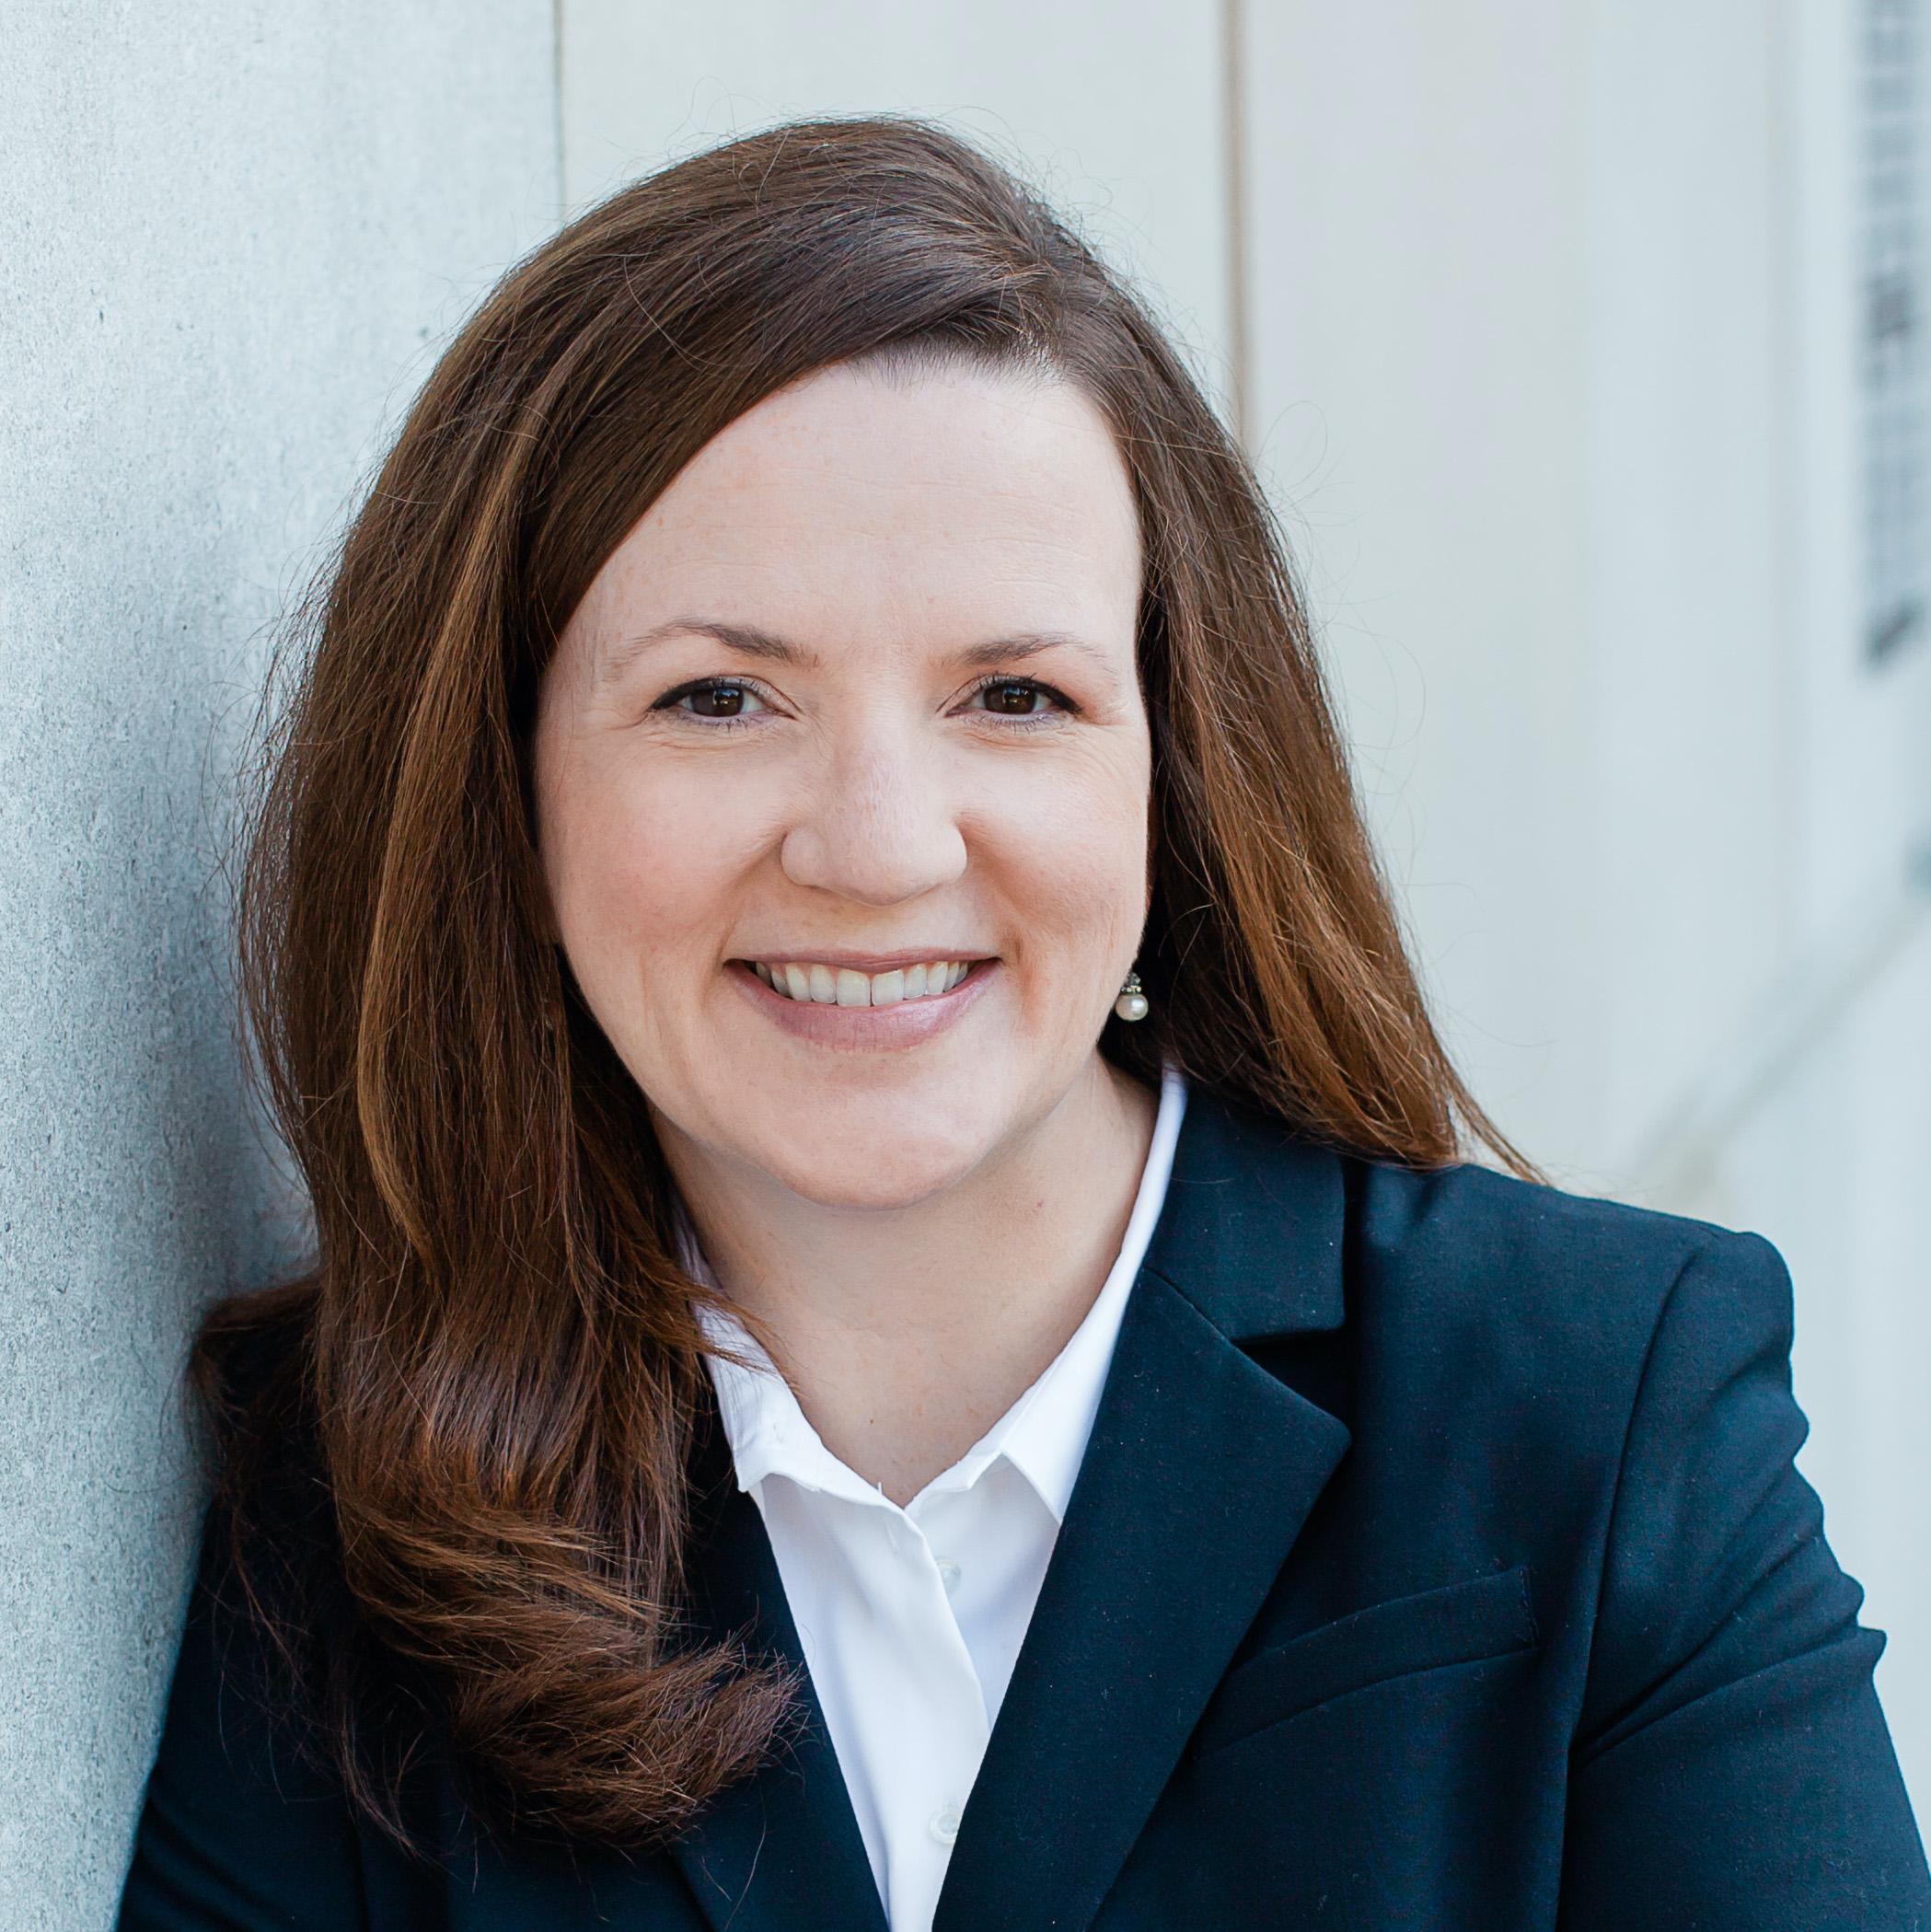 Kathy Krey, Ph.D.